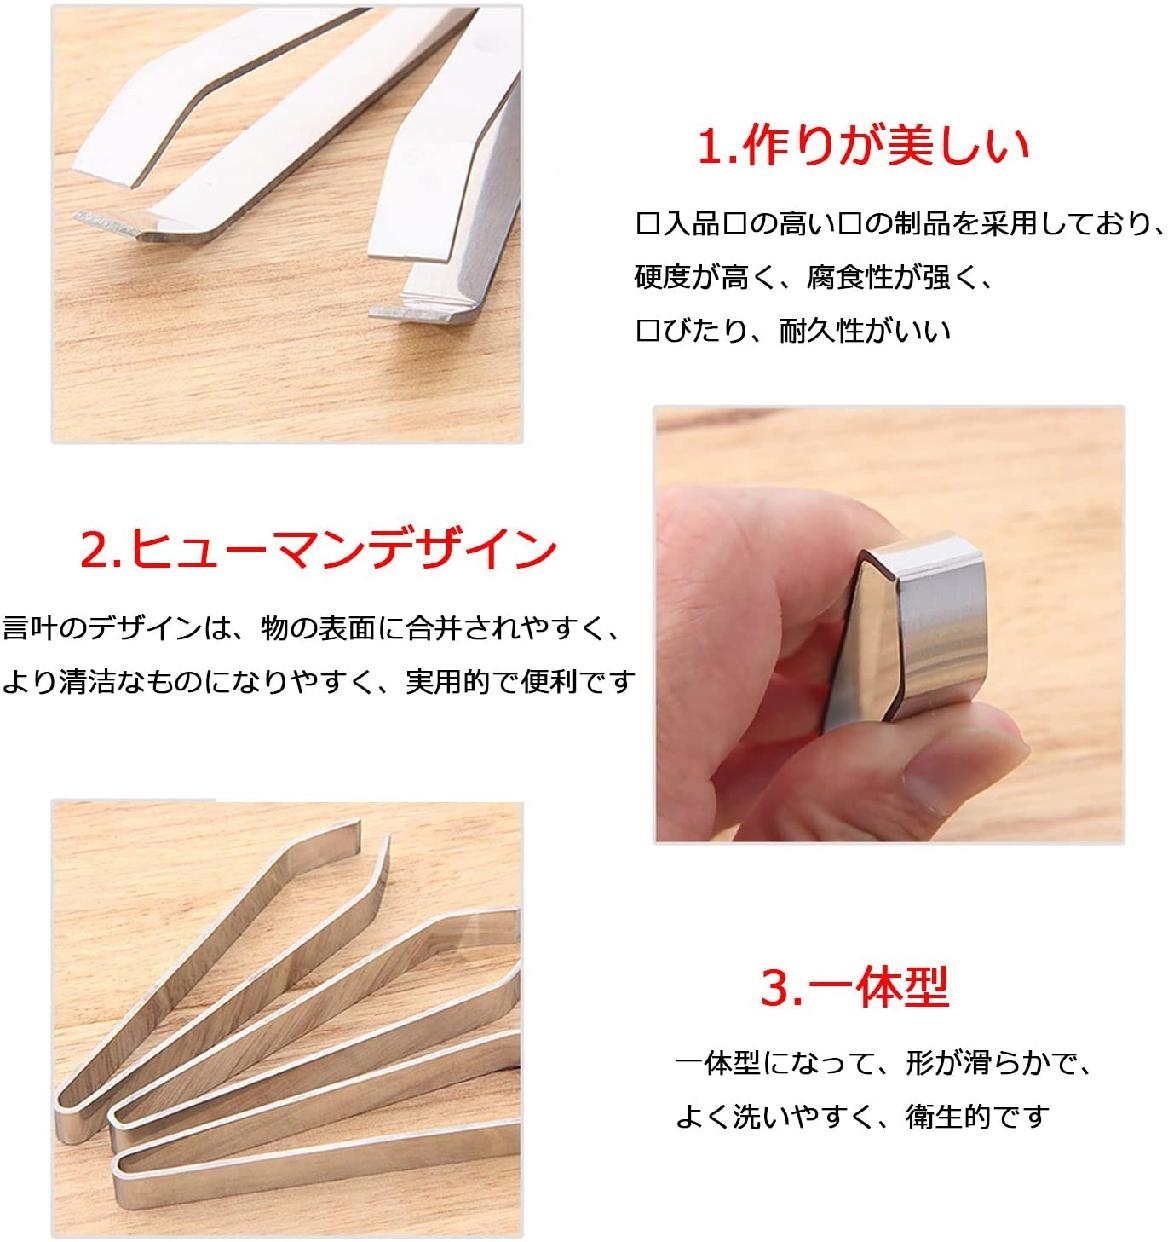 JOPINK(ジョピンク) 魚の骨抜きの商品画像3